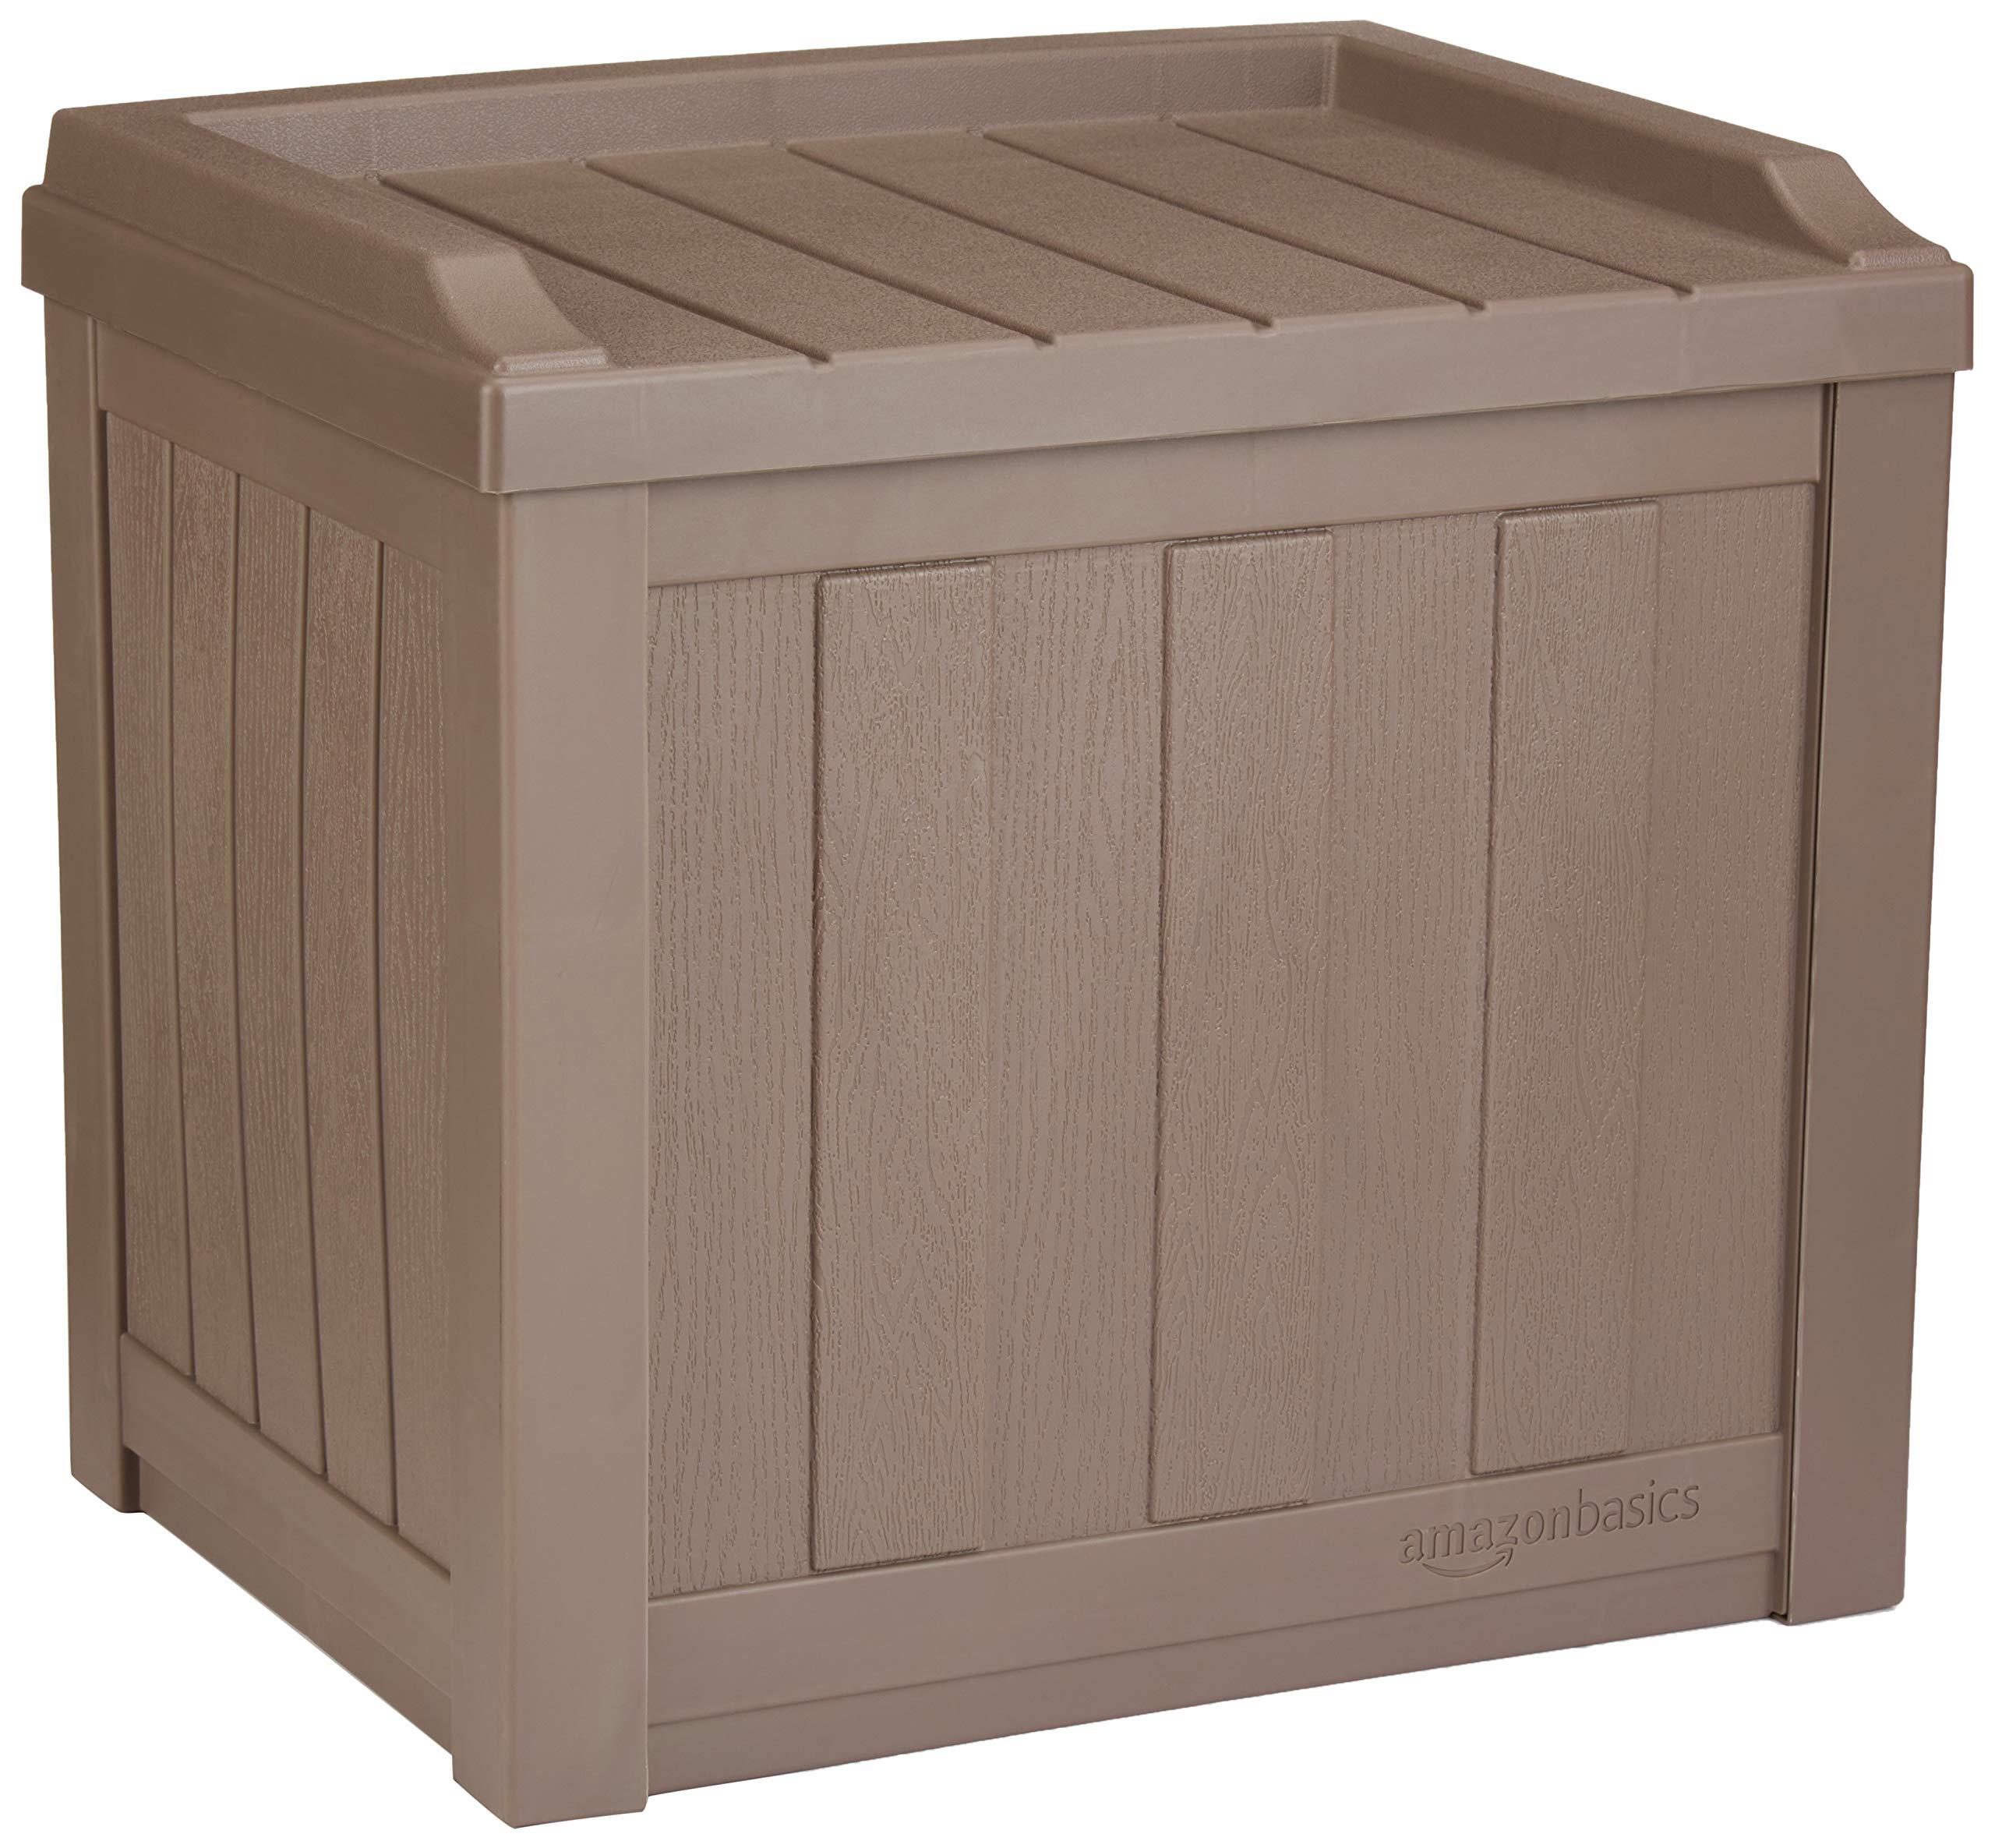 AmazonBasics 22-Gallon Resin Deck Storage Box, Mocha